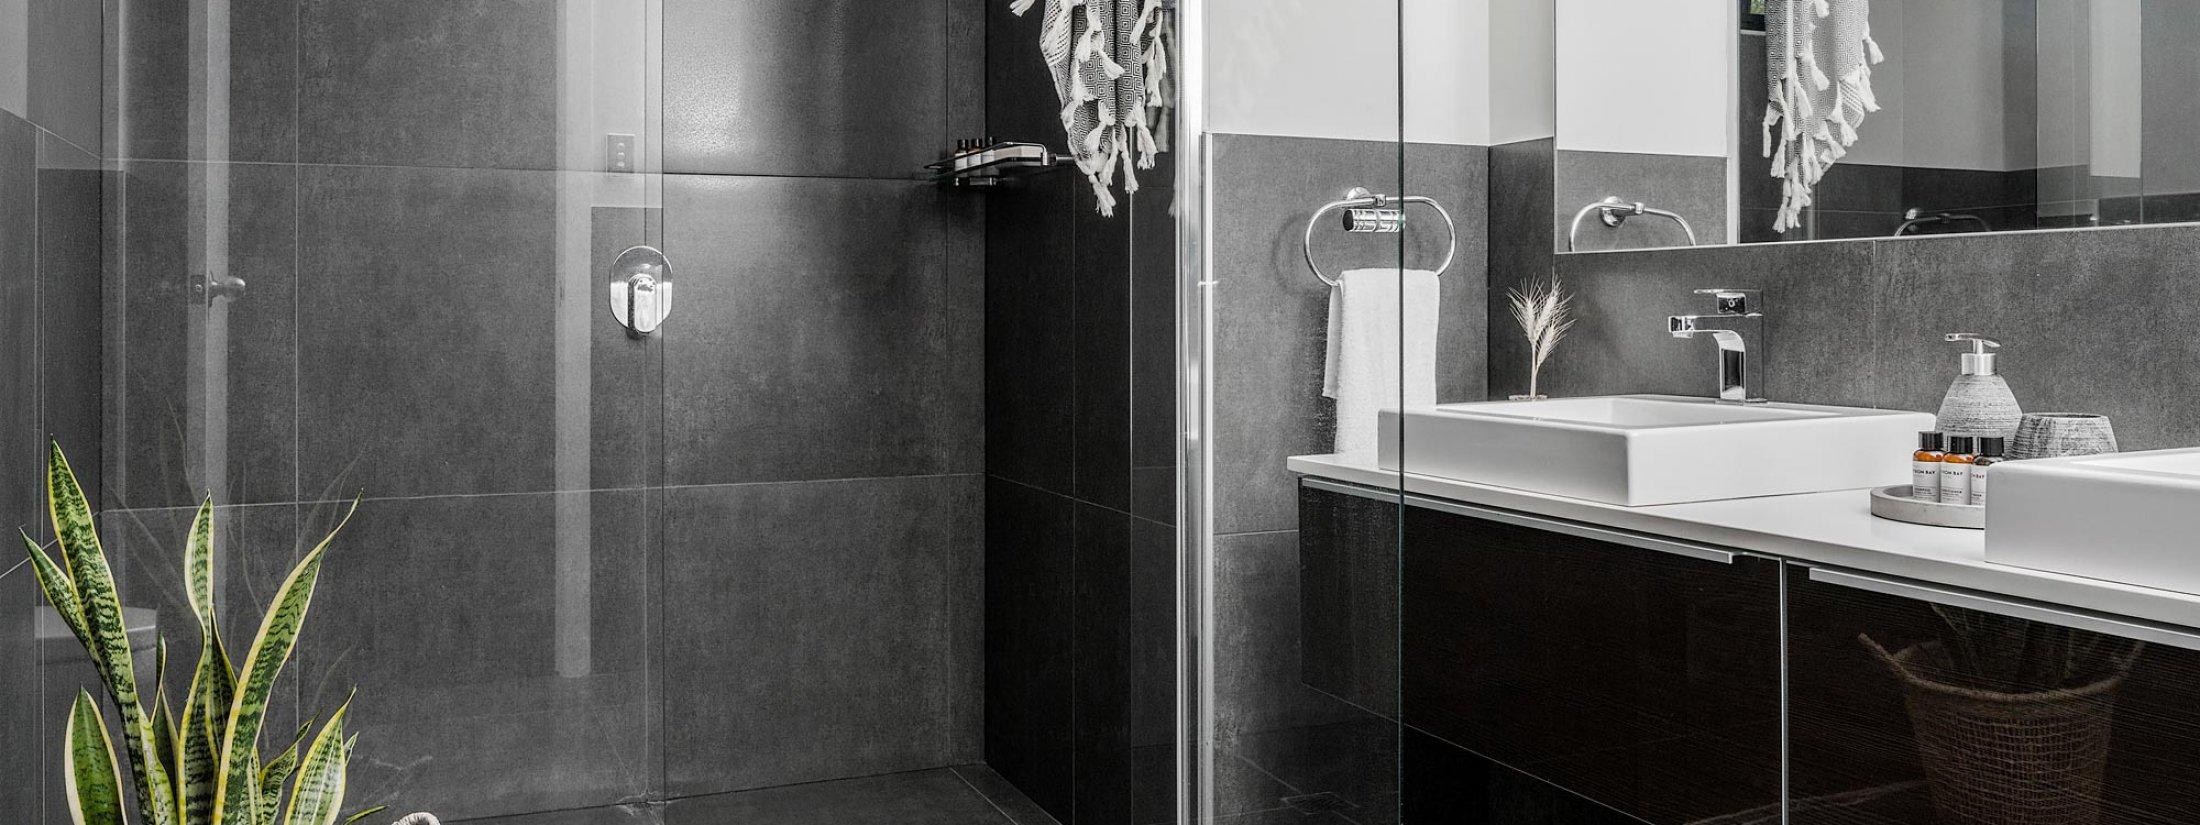 Catalinas - Byron Bay - Shared Bathroom a